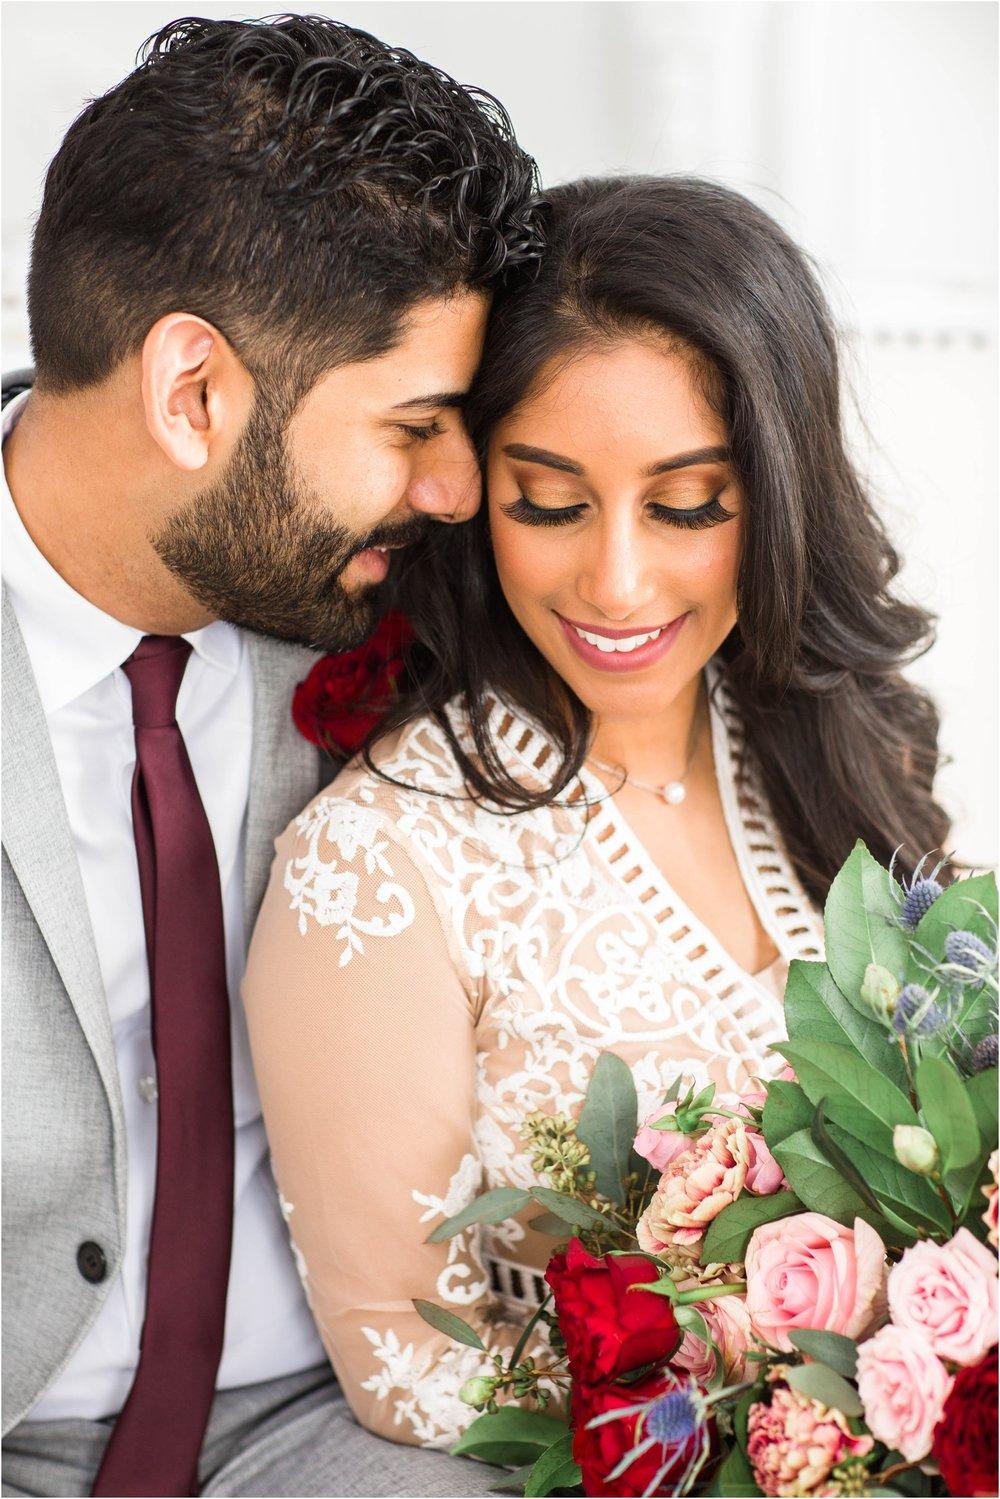 Mint-Room-Studios-Anniversary-Session-Toronto-Mississauga-Brampton-Scarborough-GTA-Pakistani-Indian-Wedding-Engagement-Photographer-Photography_0020.jpg